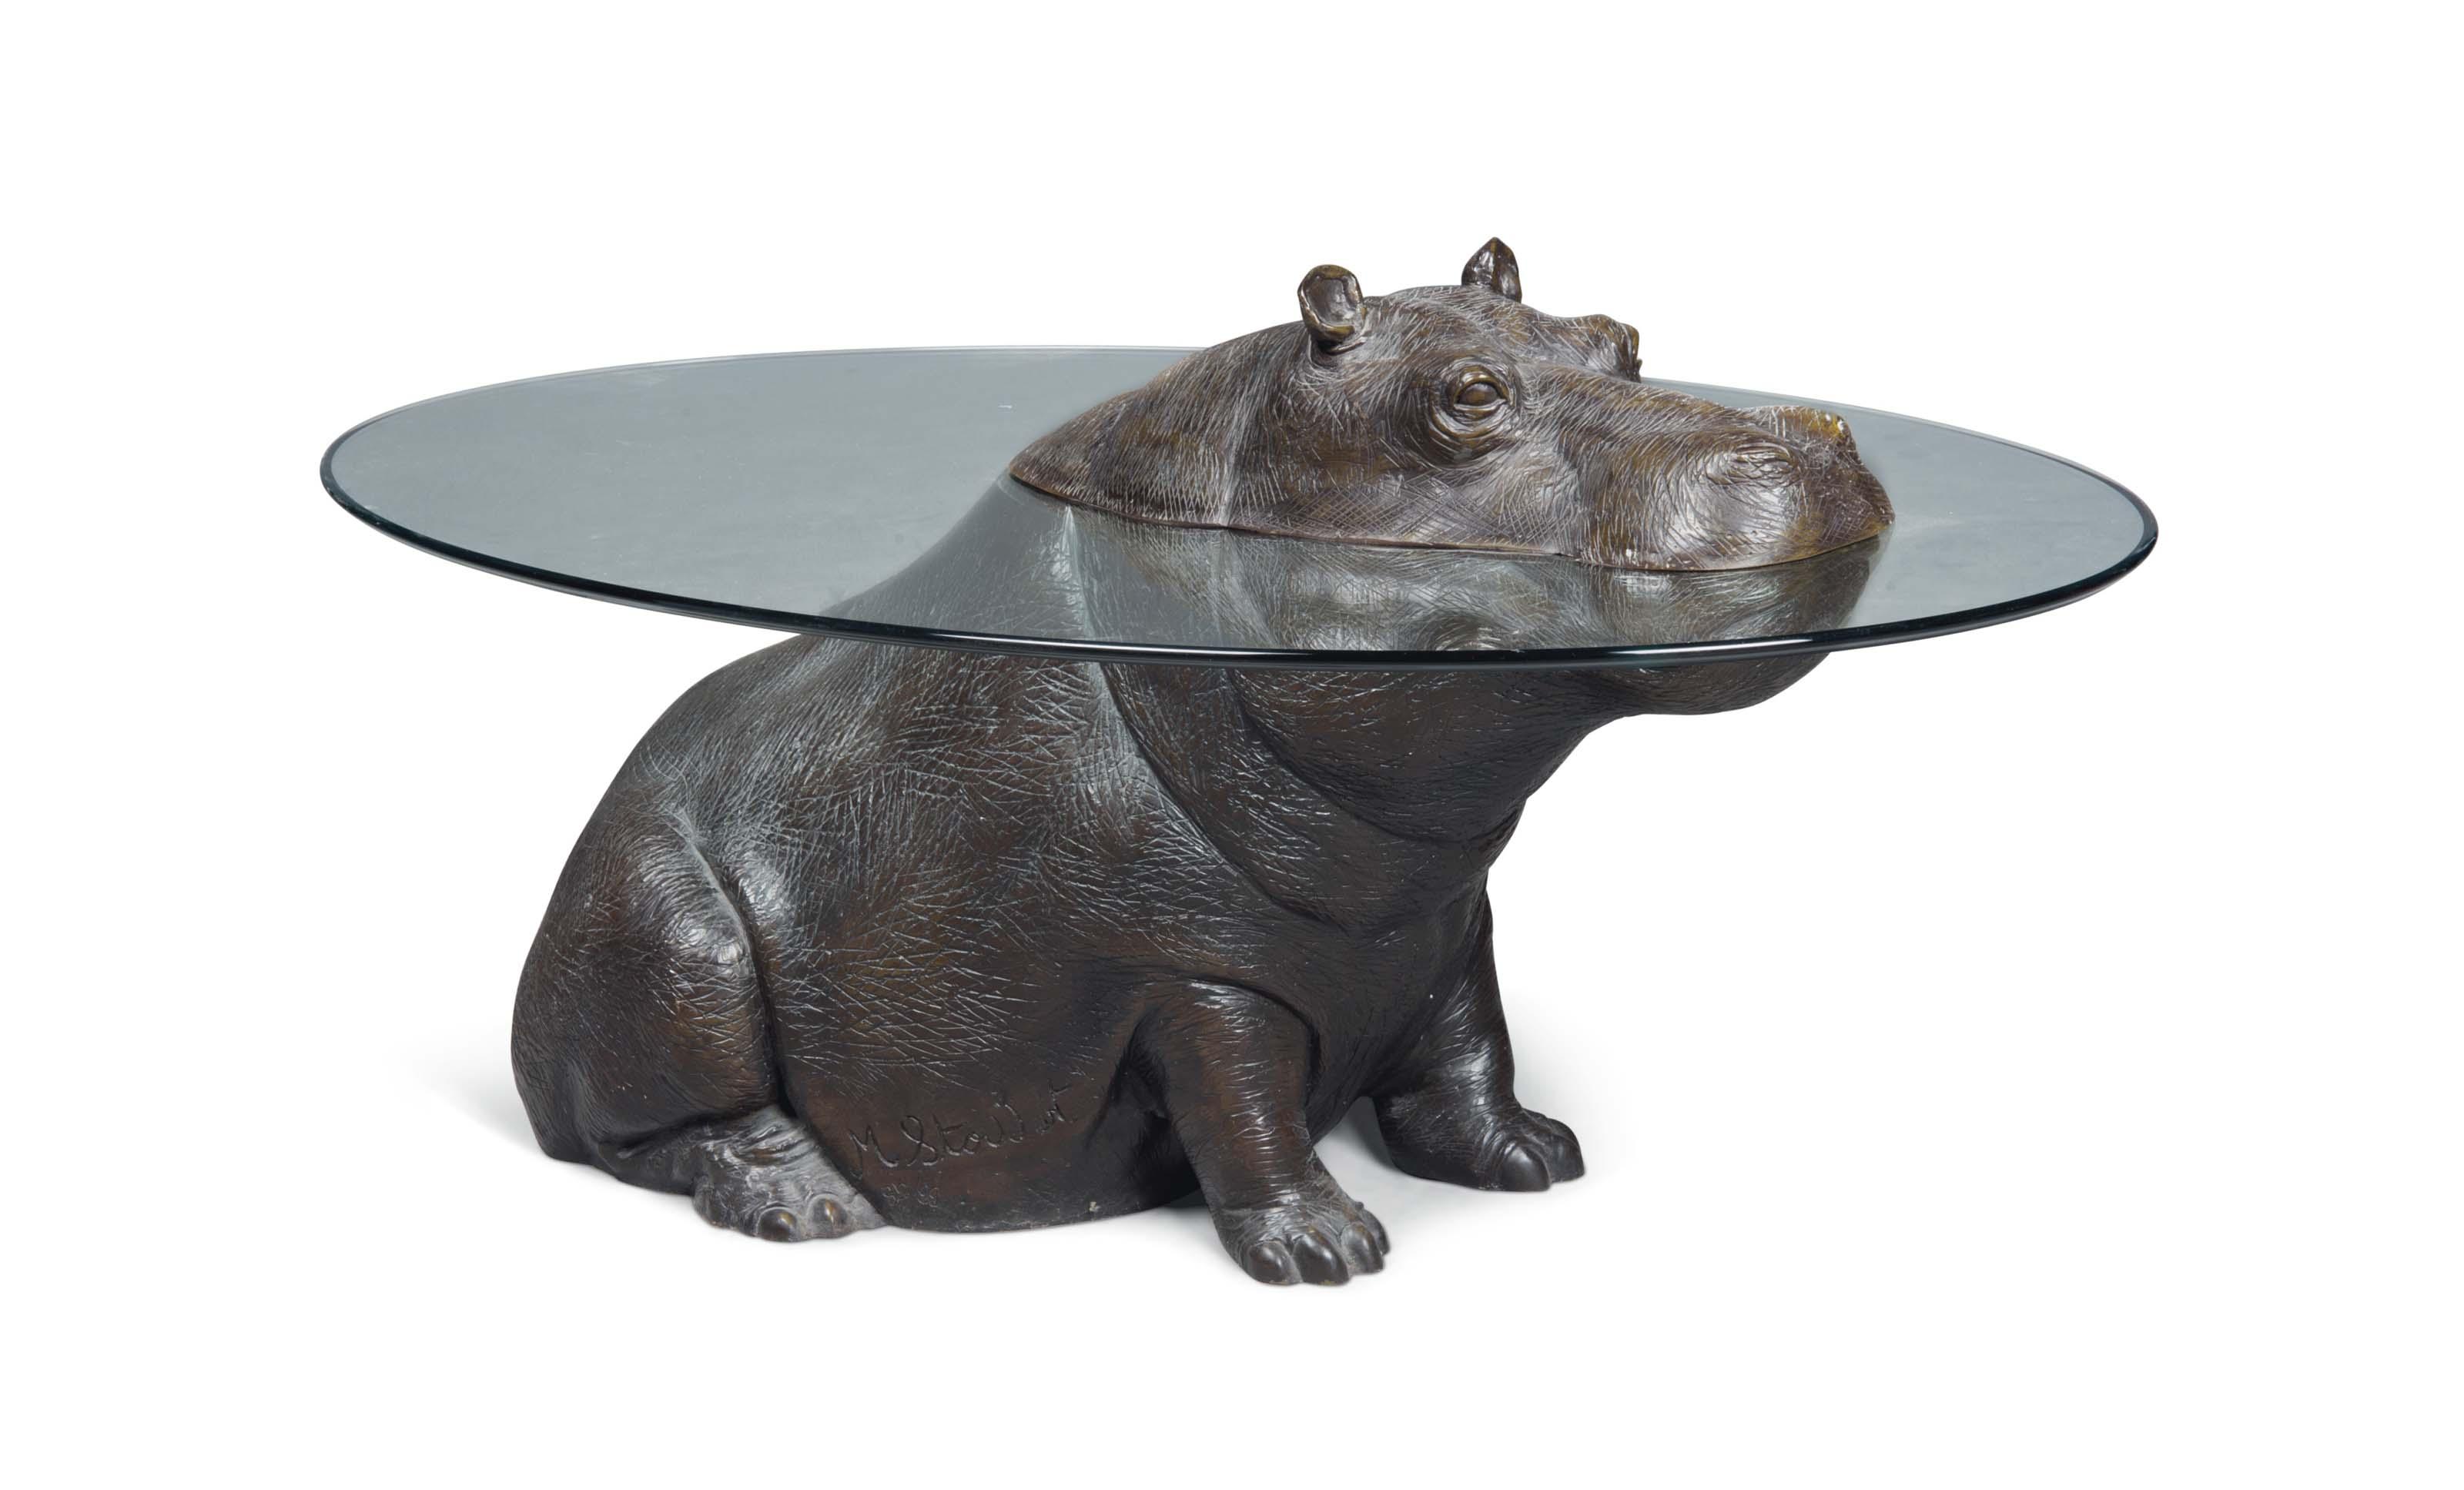 A Mark Stoddart Cheeky Hippo